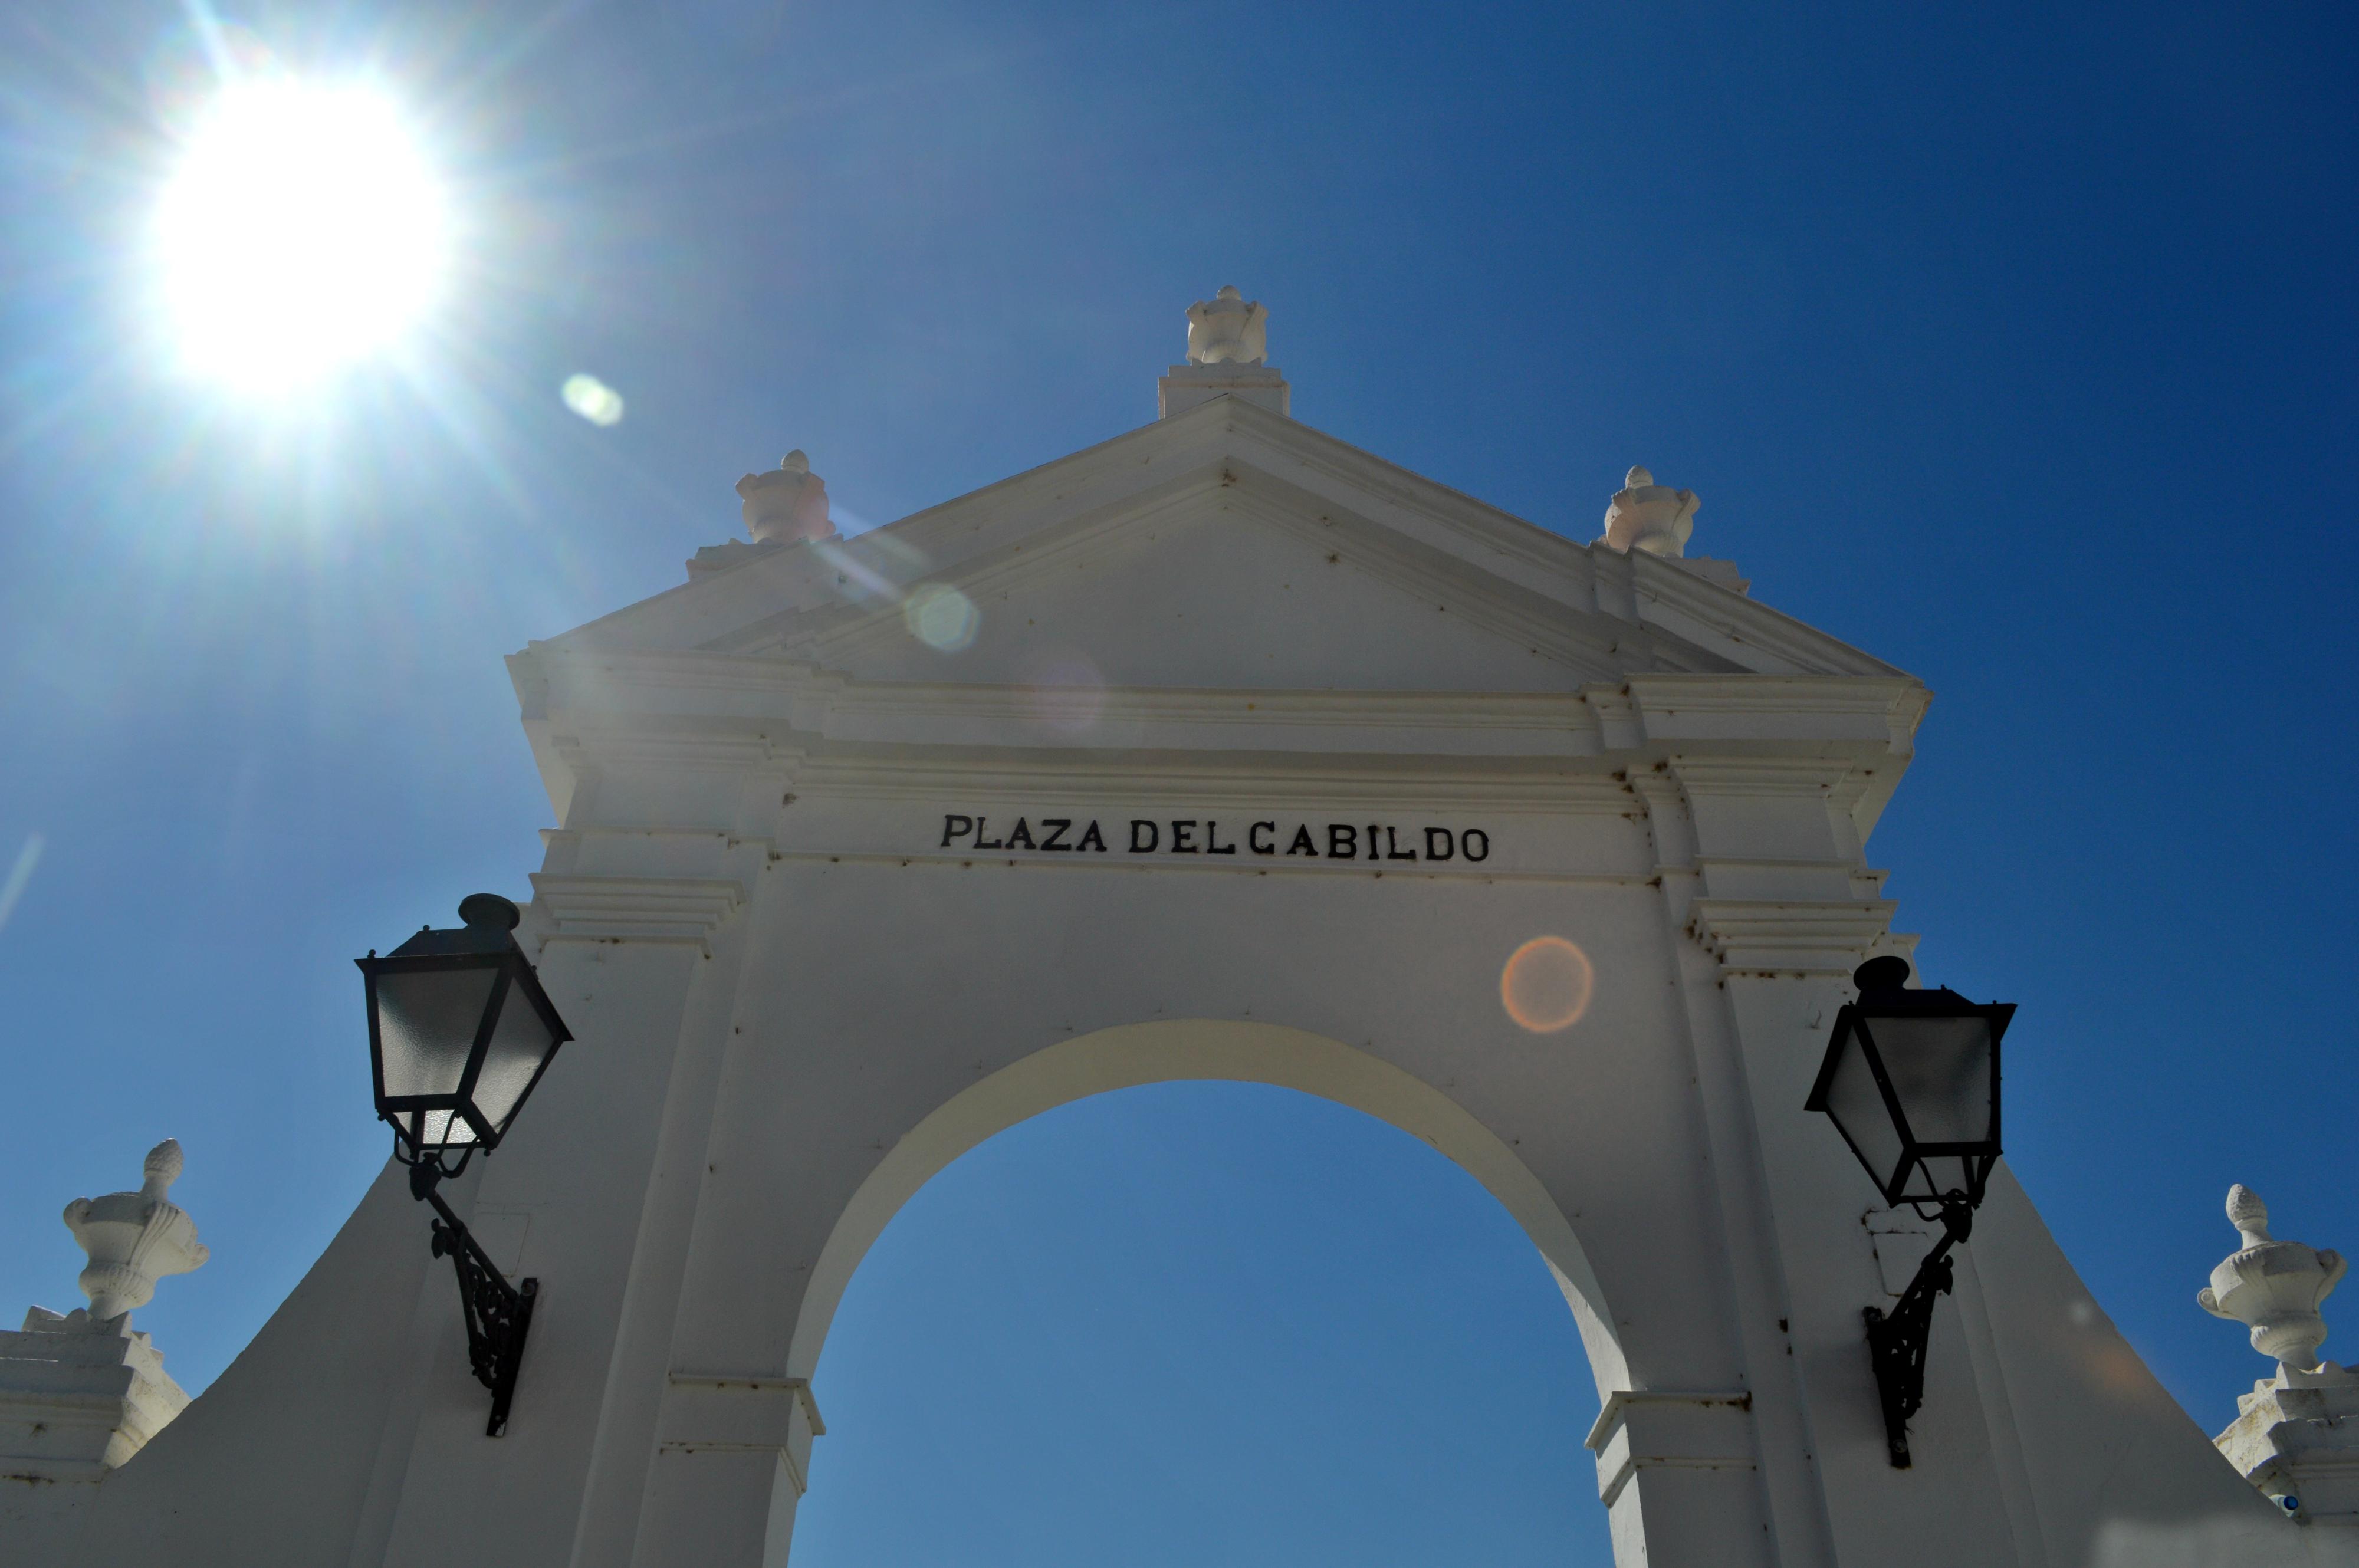 plazadelabalcone